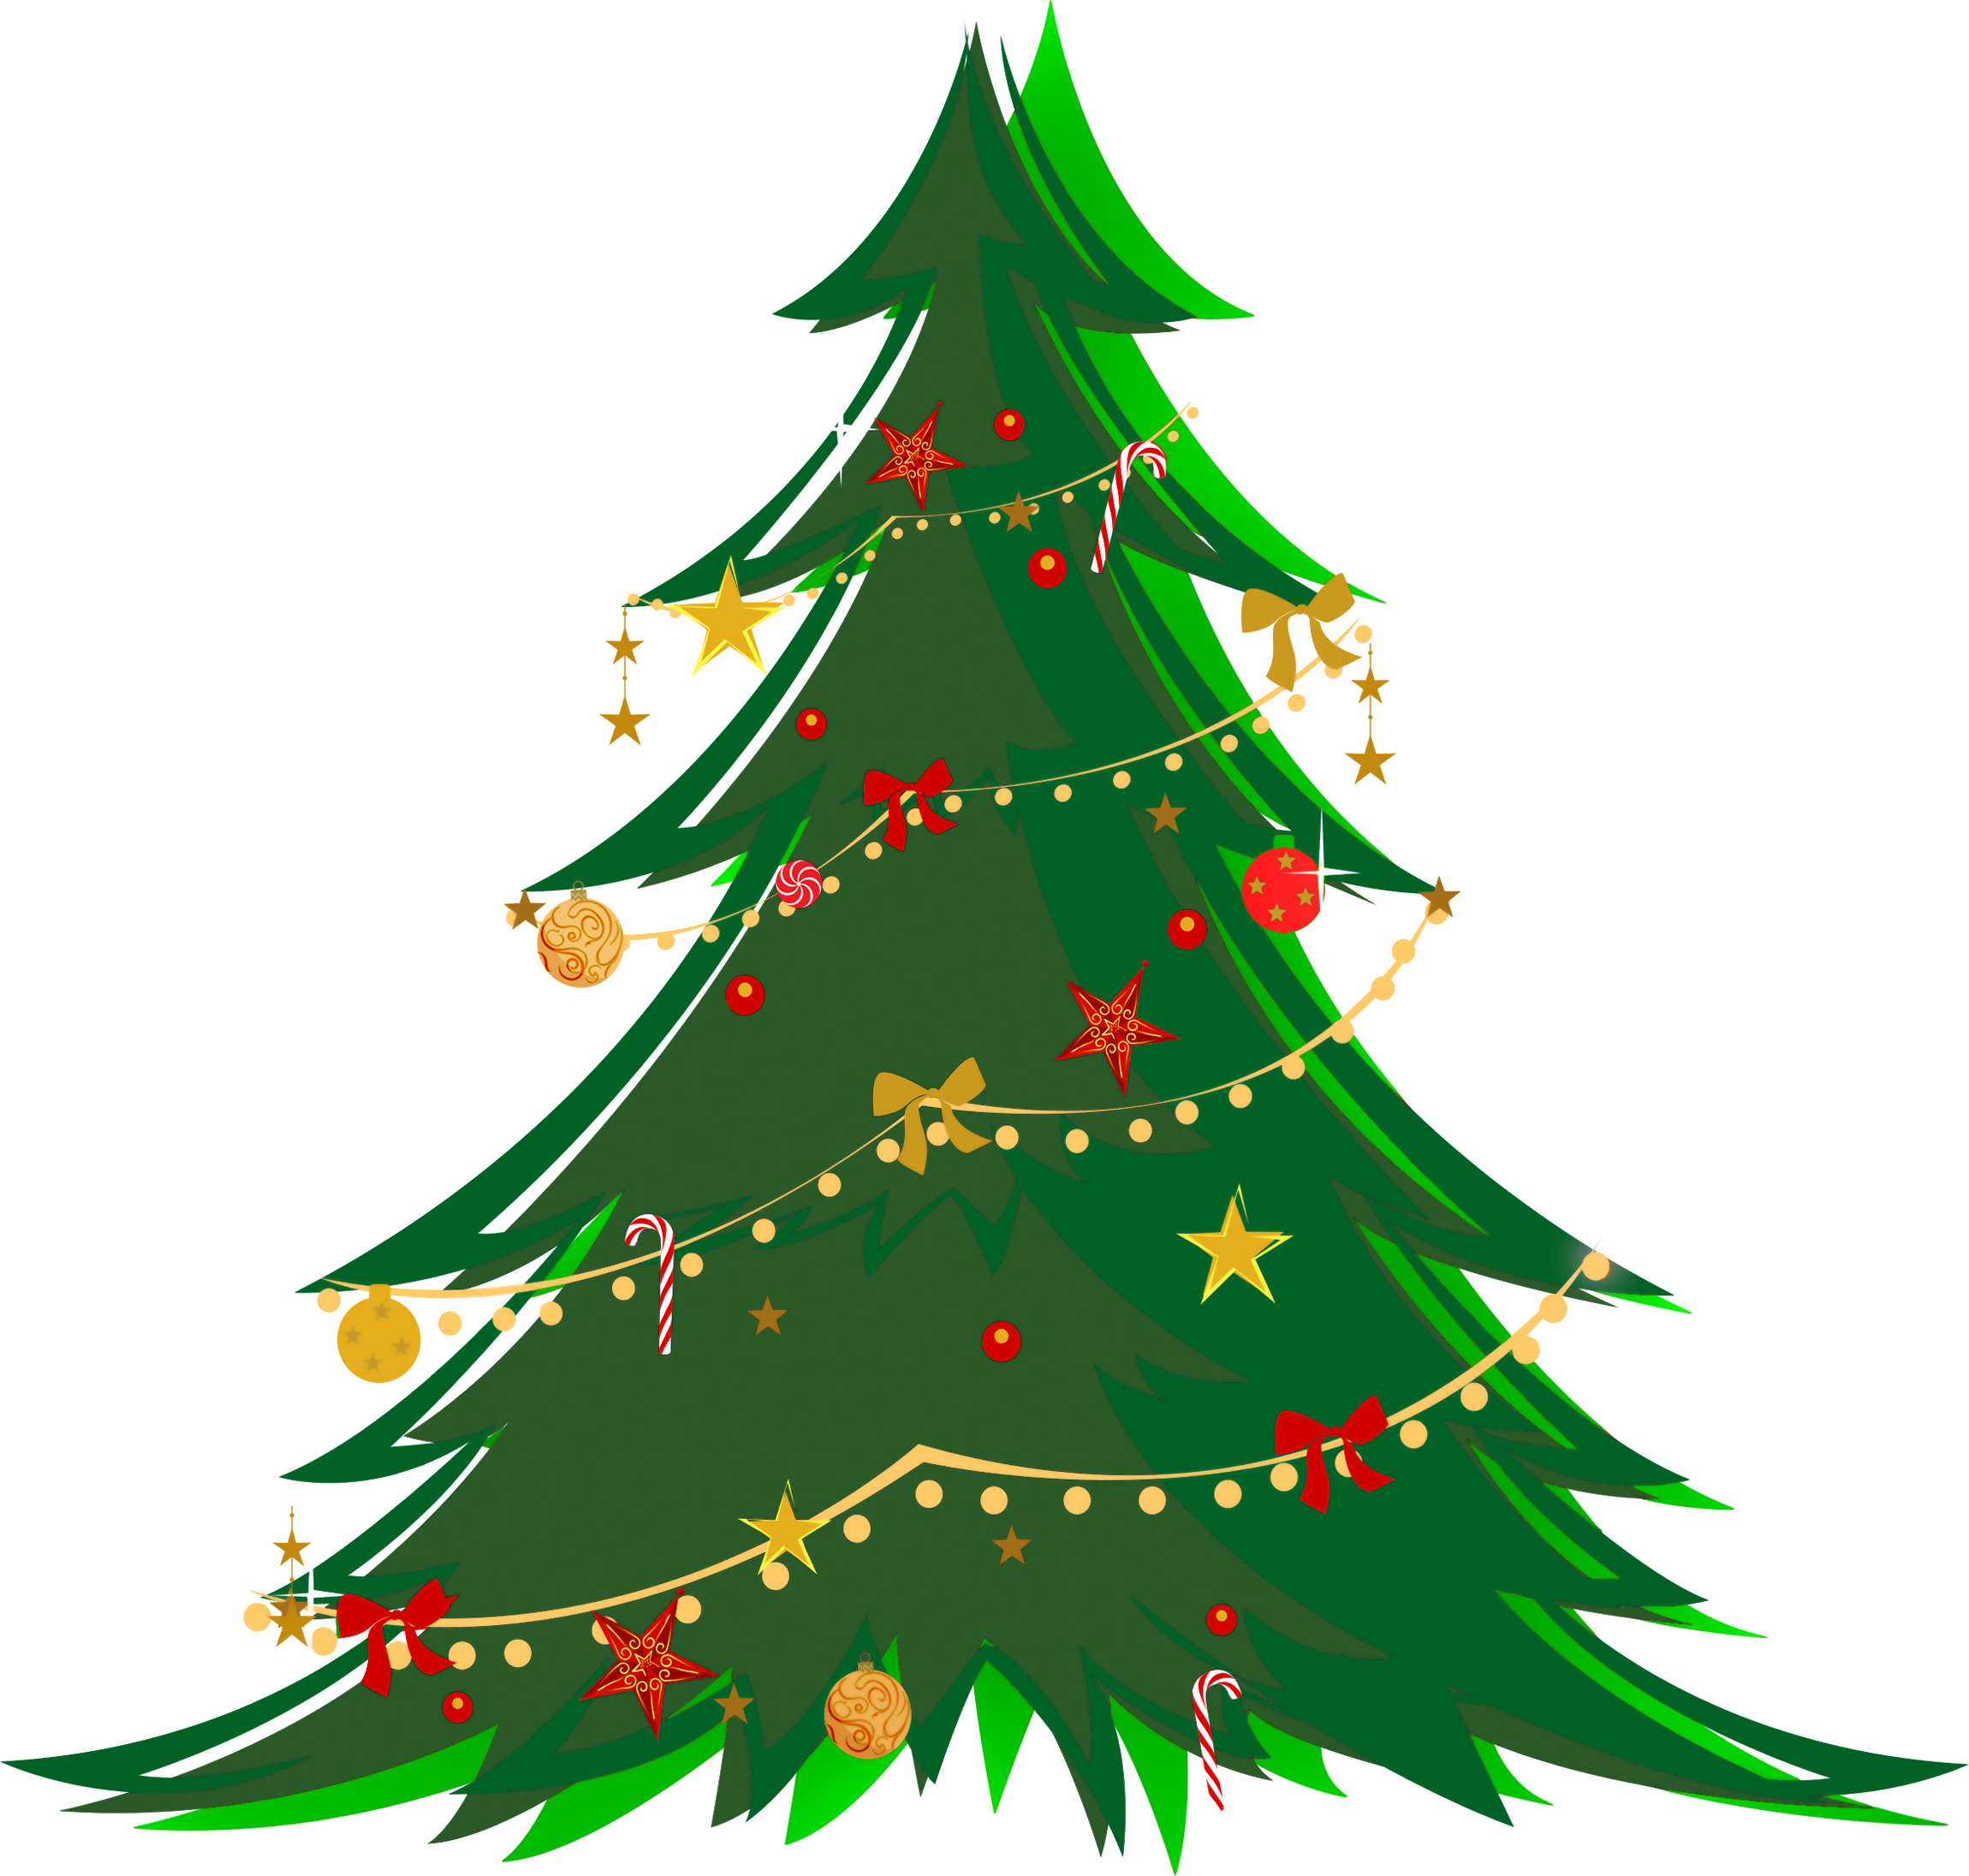 Printable Batman Logo Clipart Library Clip Art Library In 2020 Christmas Tree Clipart Christmas Wreath Clipart Christmas Stocking Decorations